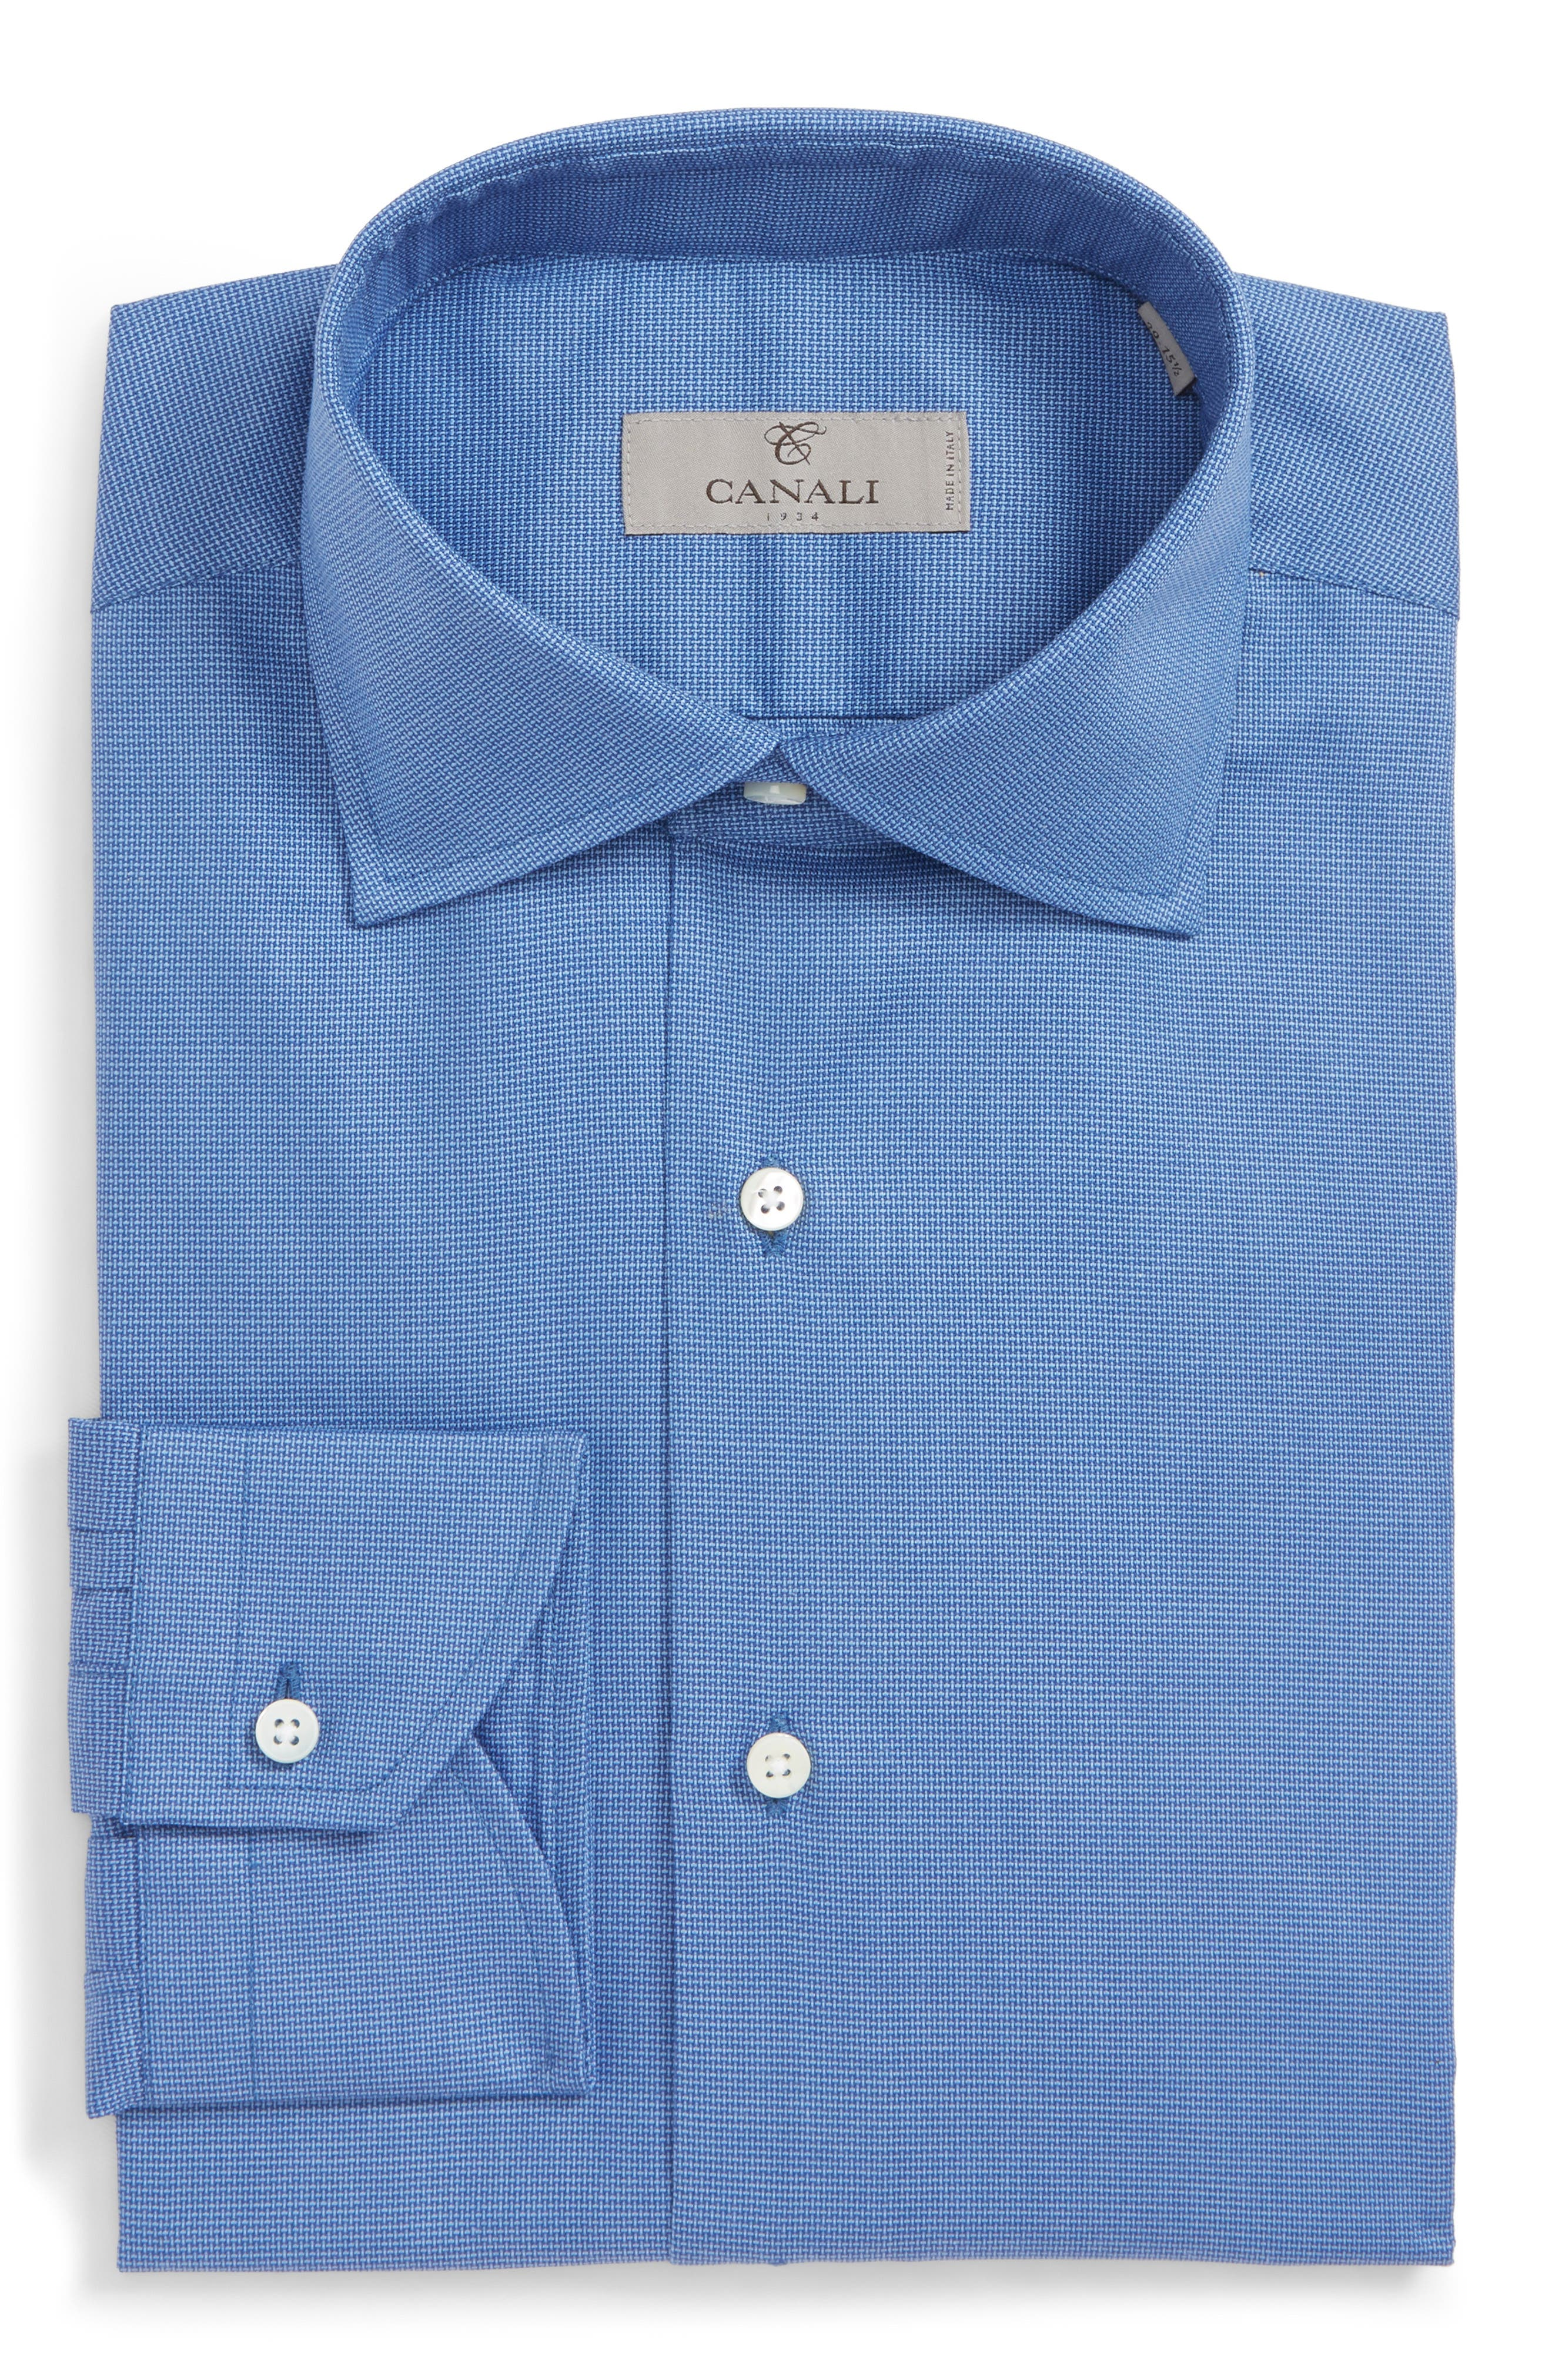 Trim Fit Dress Shirt,                             Alternate thumbnail 5, color,                             DARK BLUE